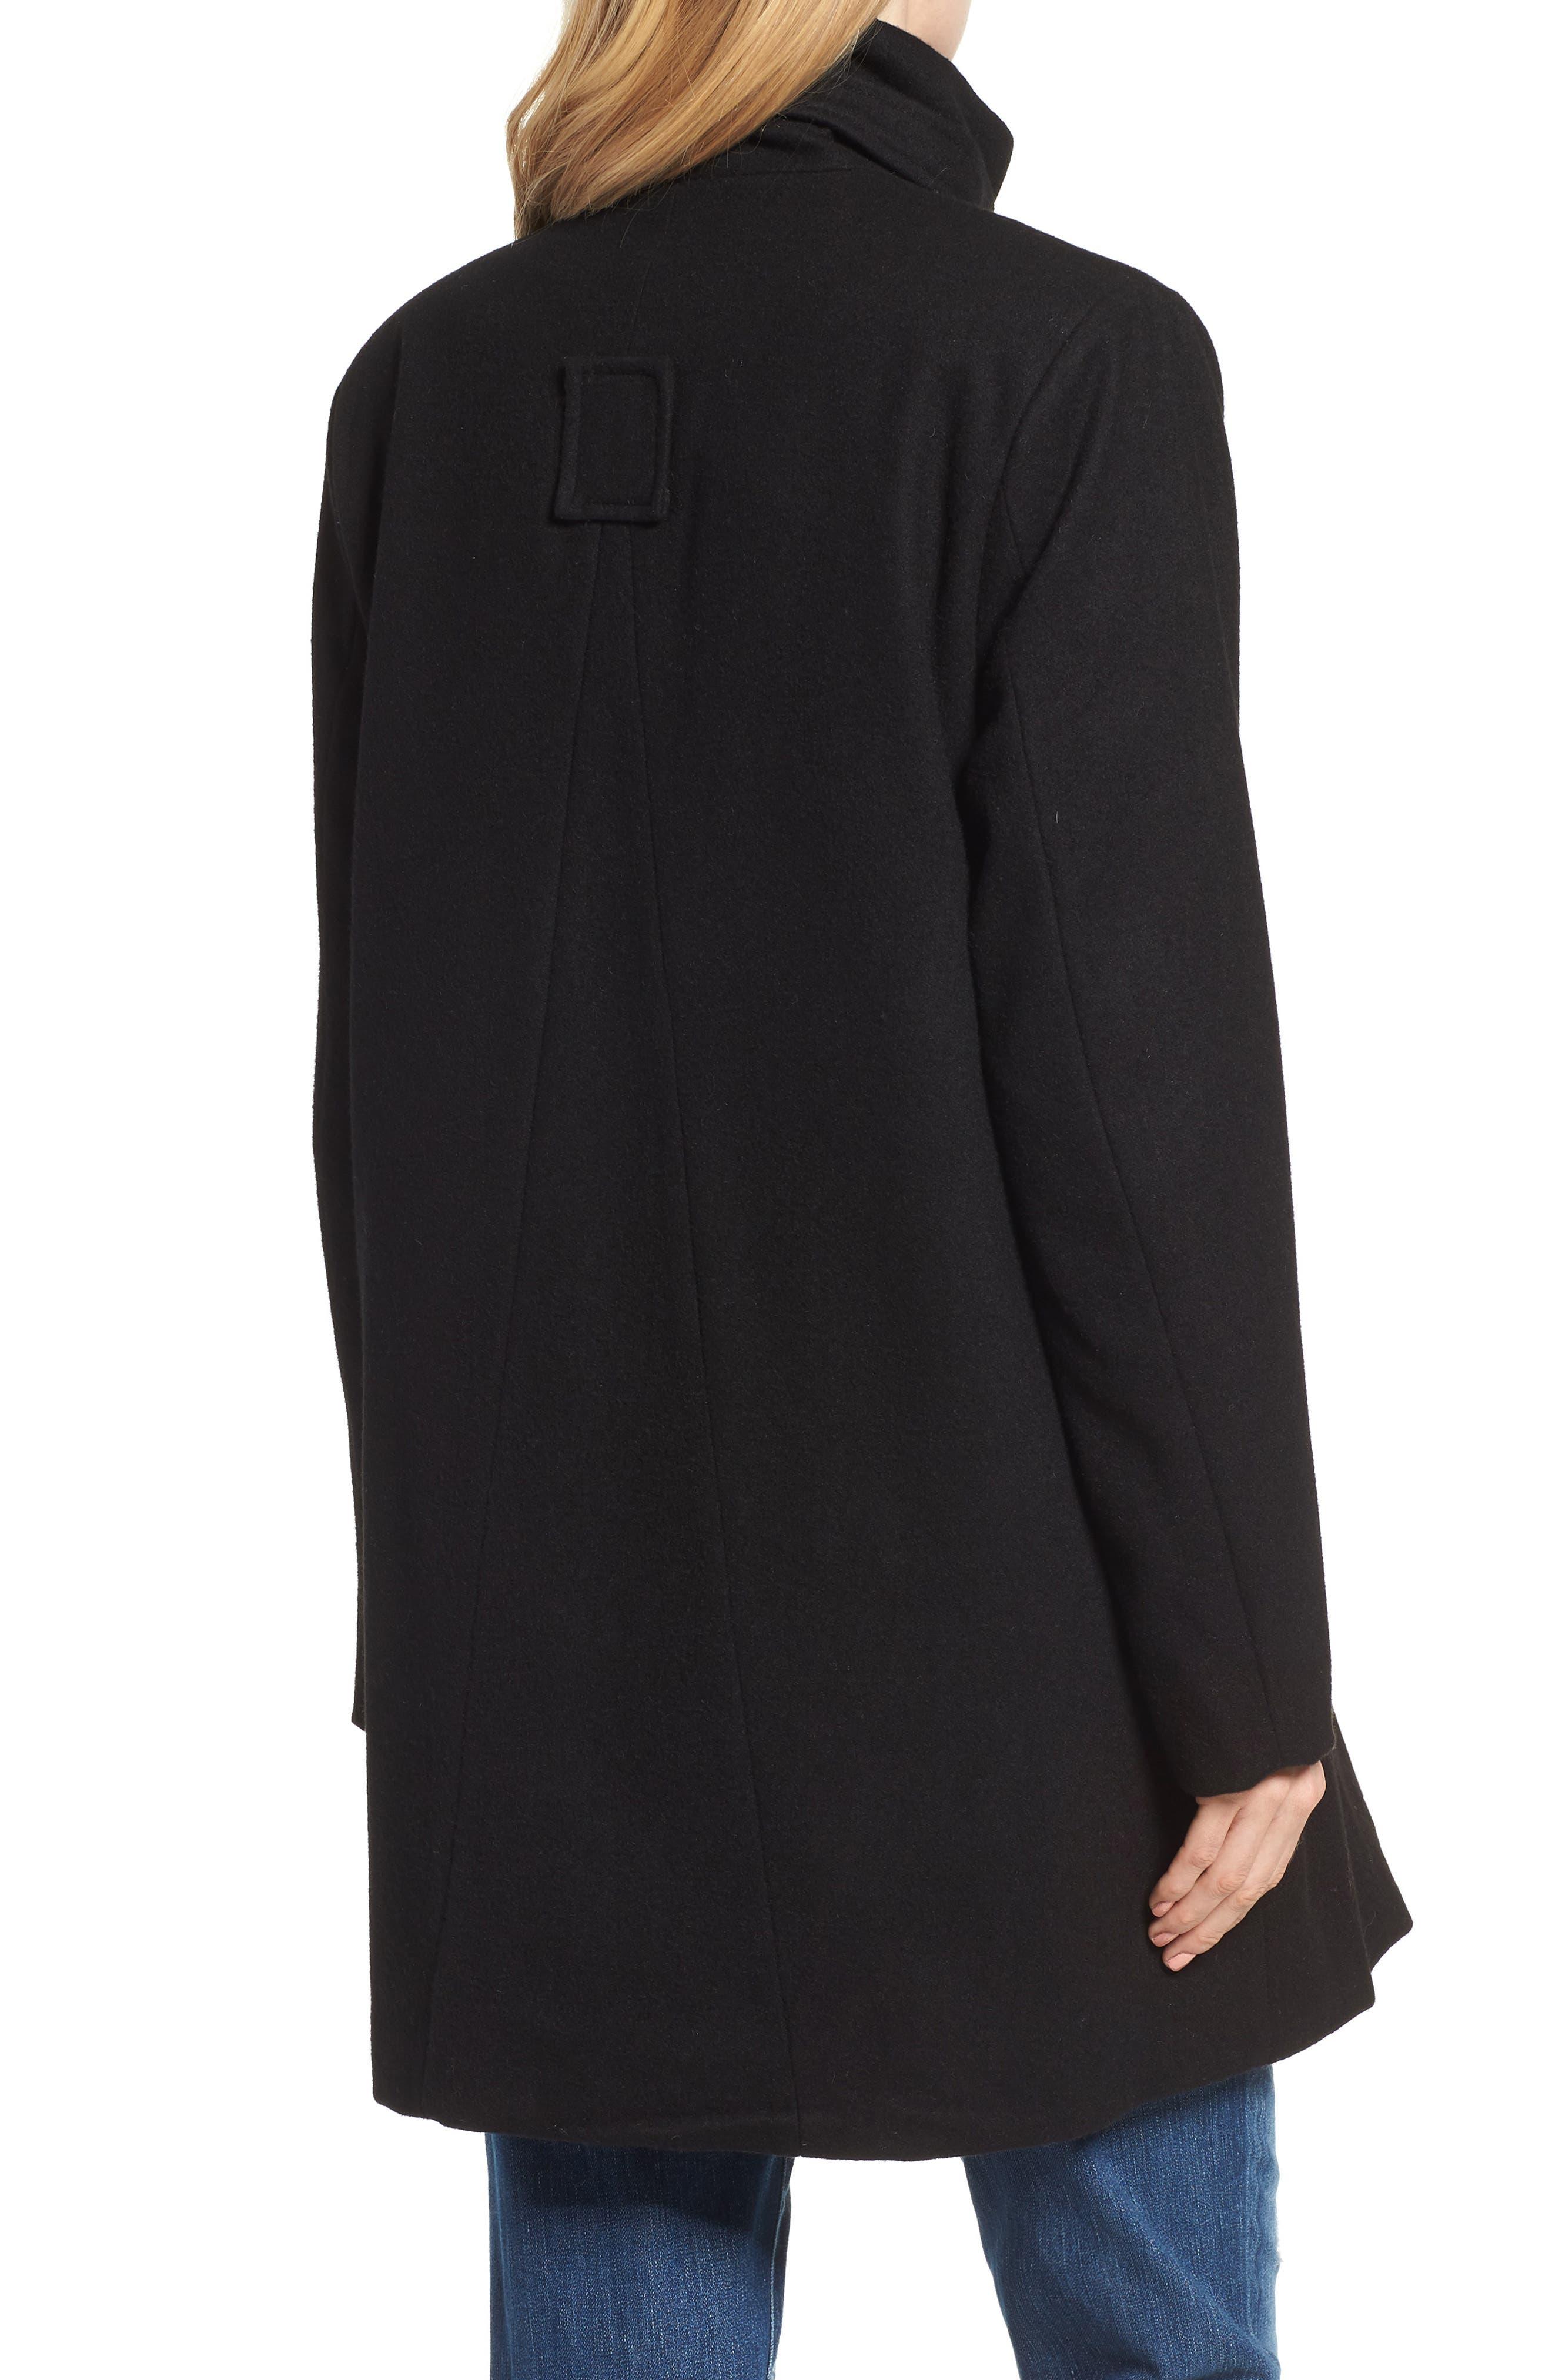 MODERN ETERNITY, Convertible 3-in-1 Maternity/Nursing Coat, Alternate thumbnail 3, color, BLACK